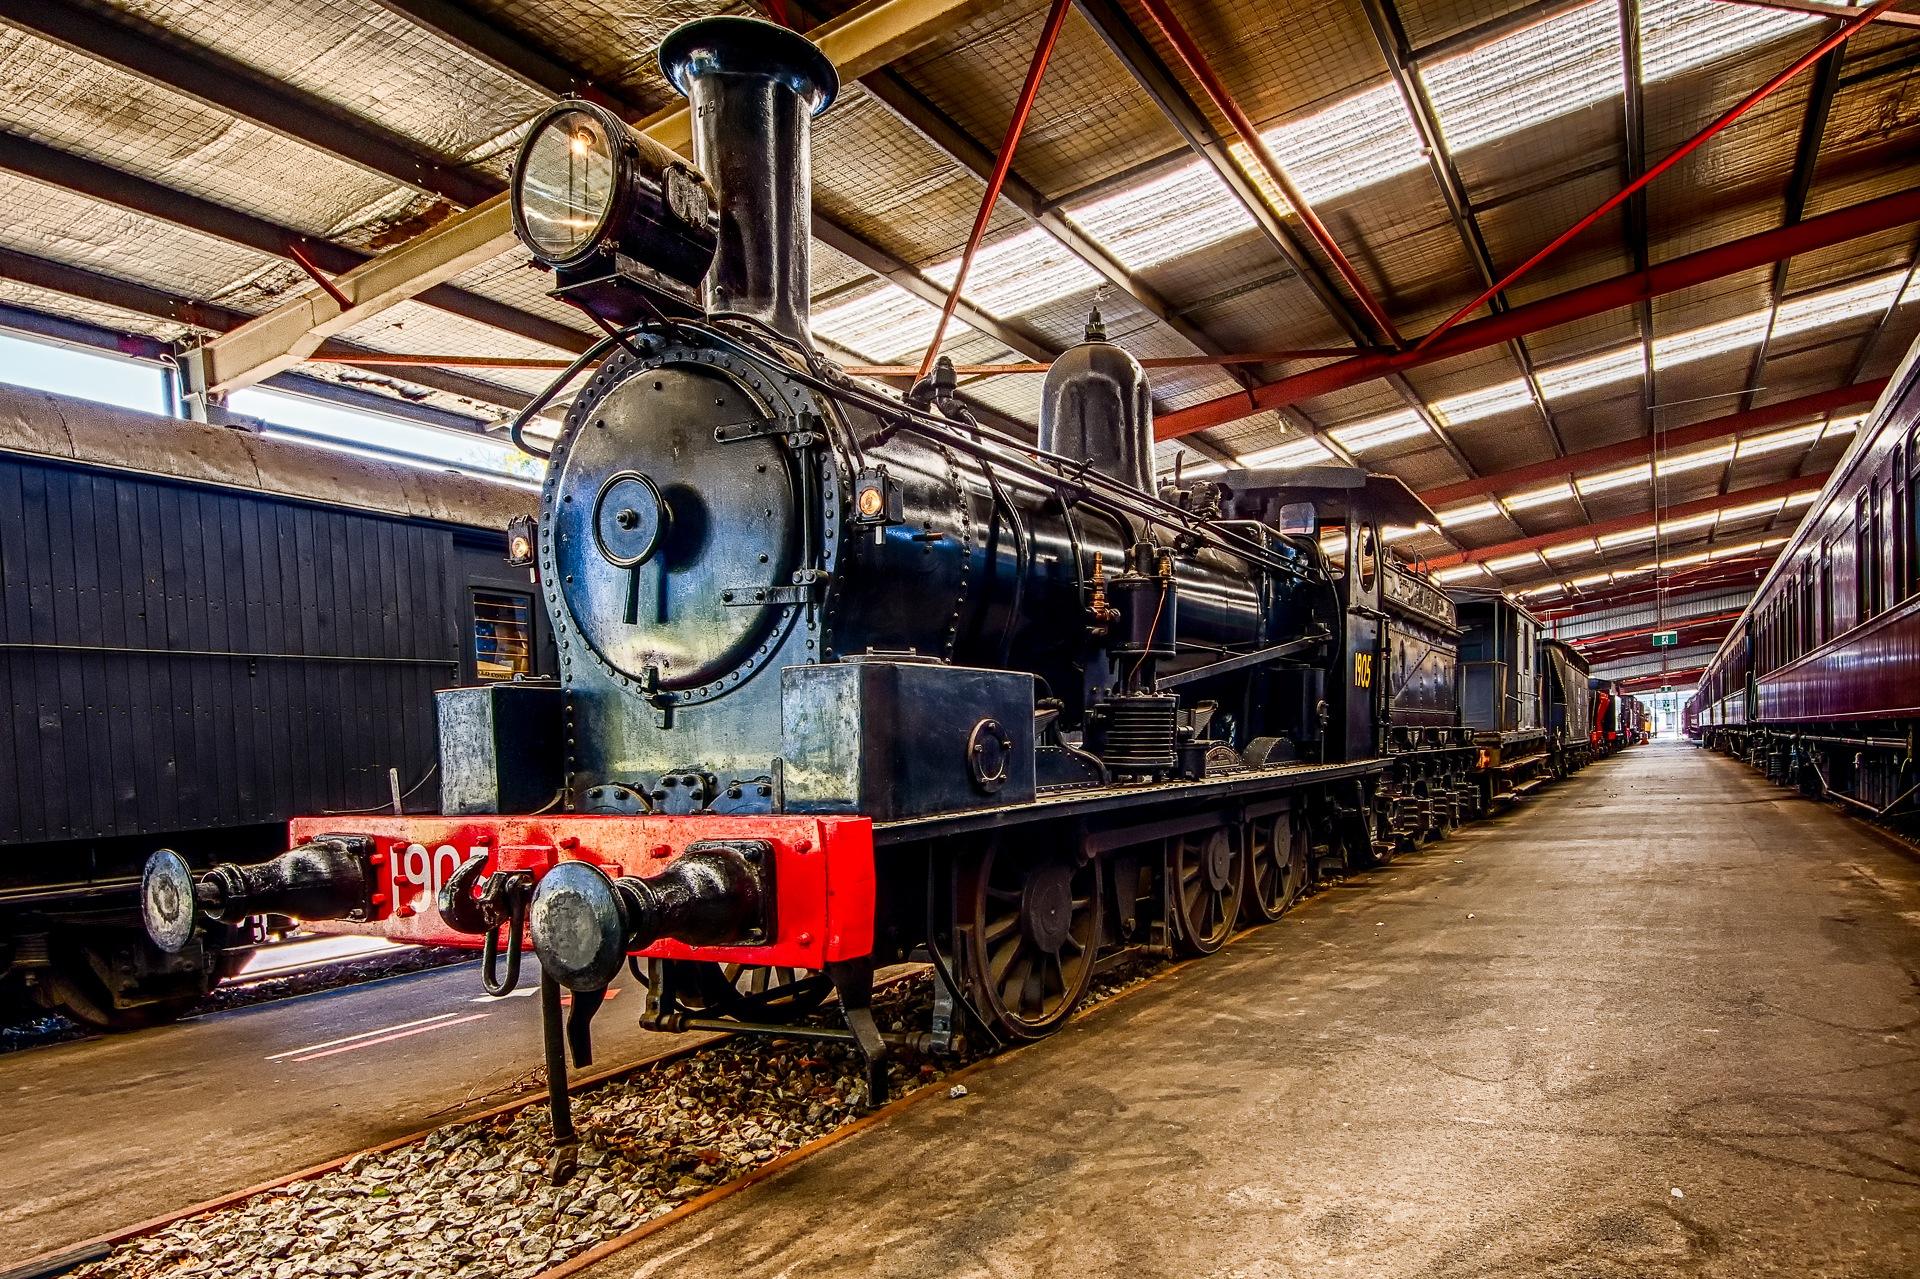 Steam Locomotive by David Kemp